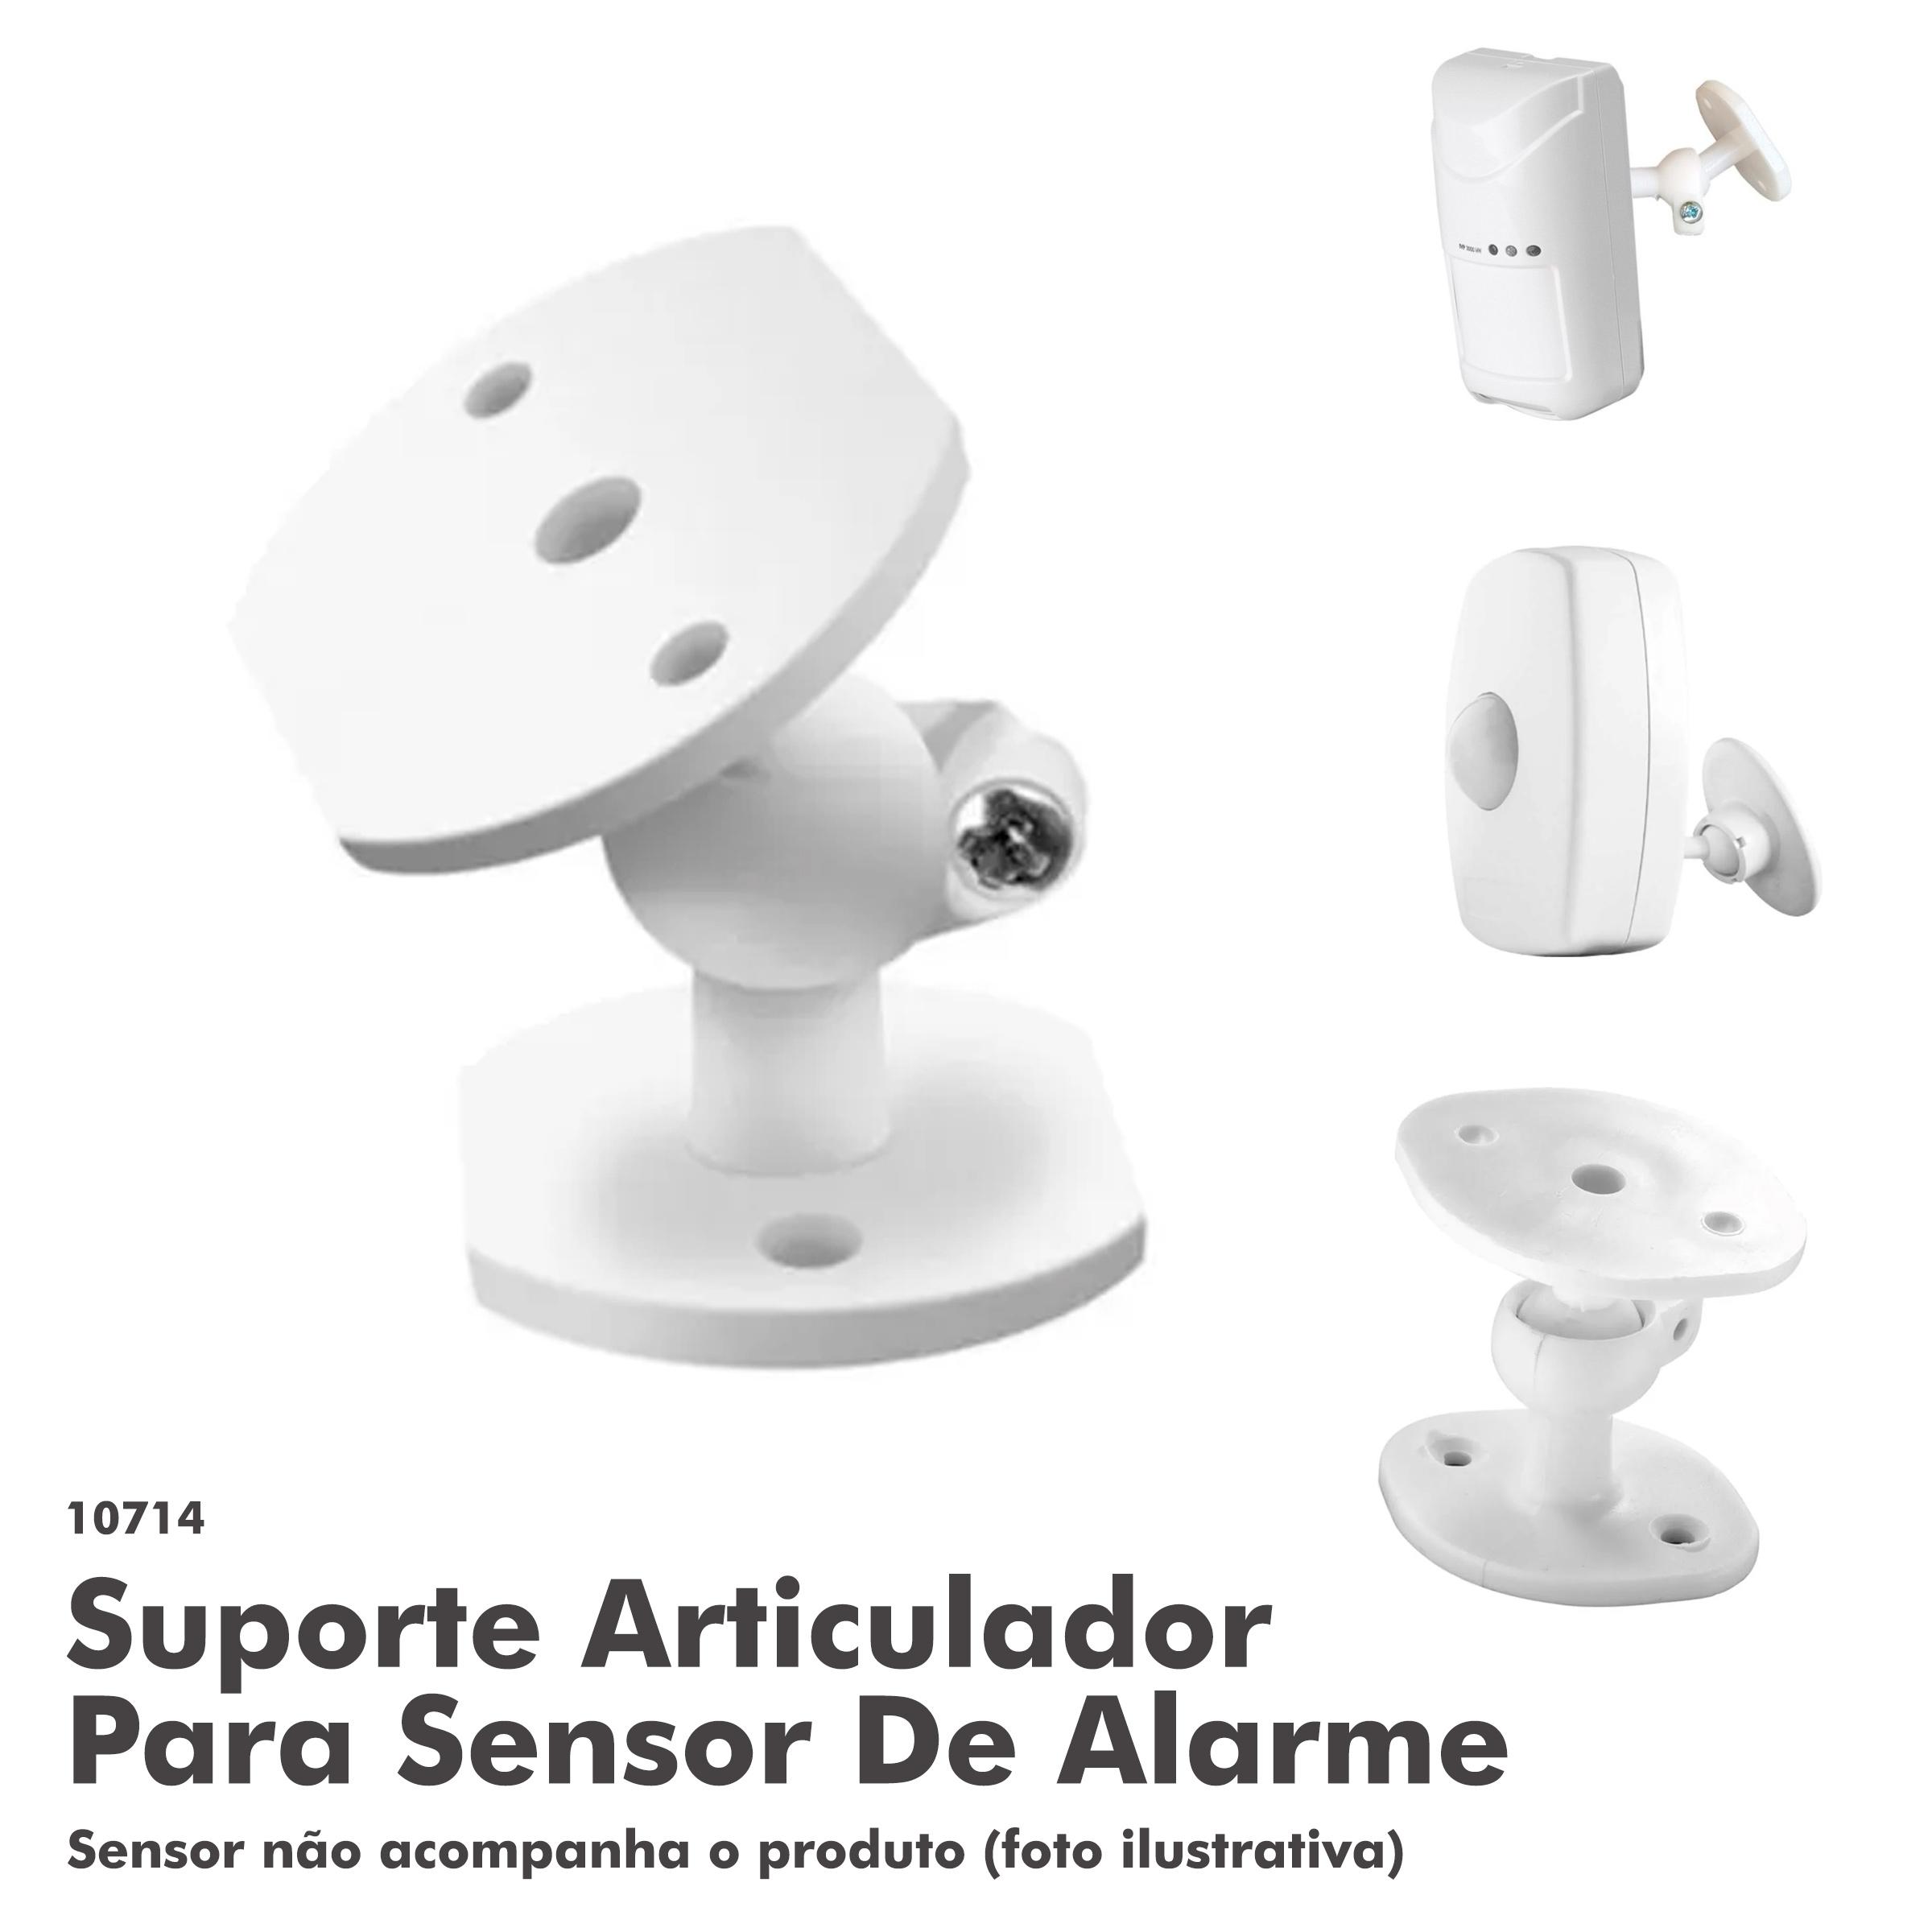 kit-3-cameras-de-seguranca-full-hd-intelbras-vhd-1220-b-g6-dvr-intelbras-04-canais-full-hd-mhdx-3104-acessorios-01